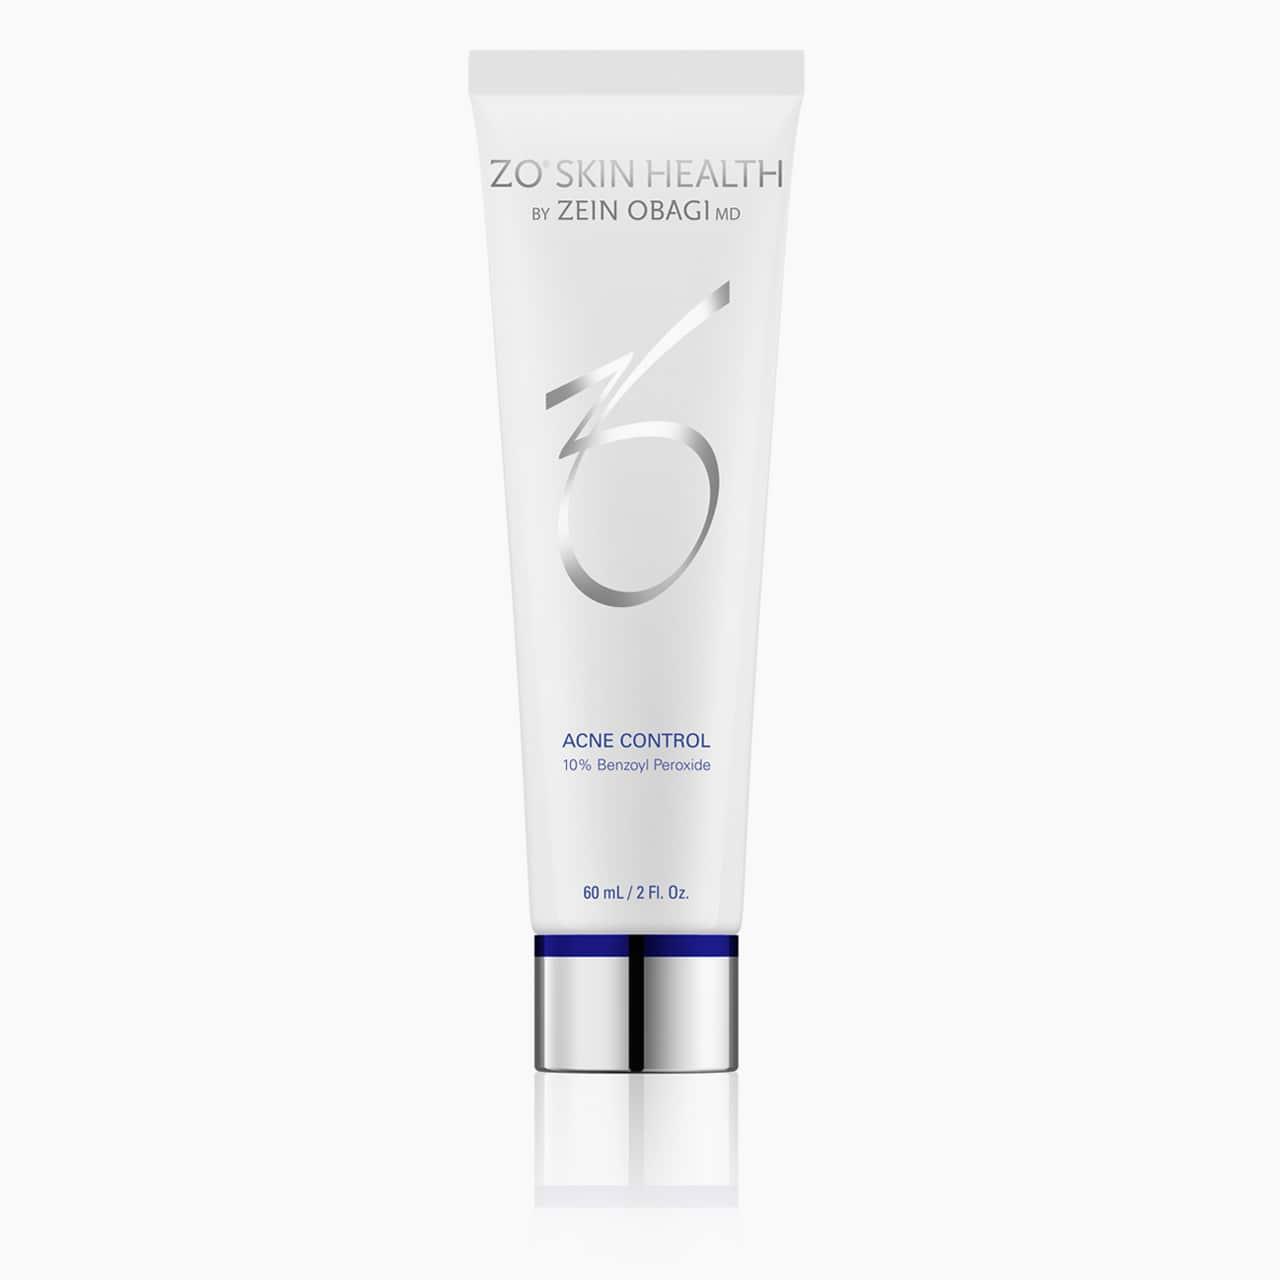 ZO Skin Health Acne Control